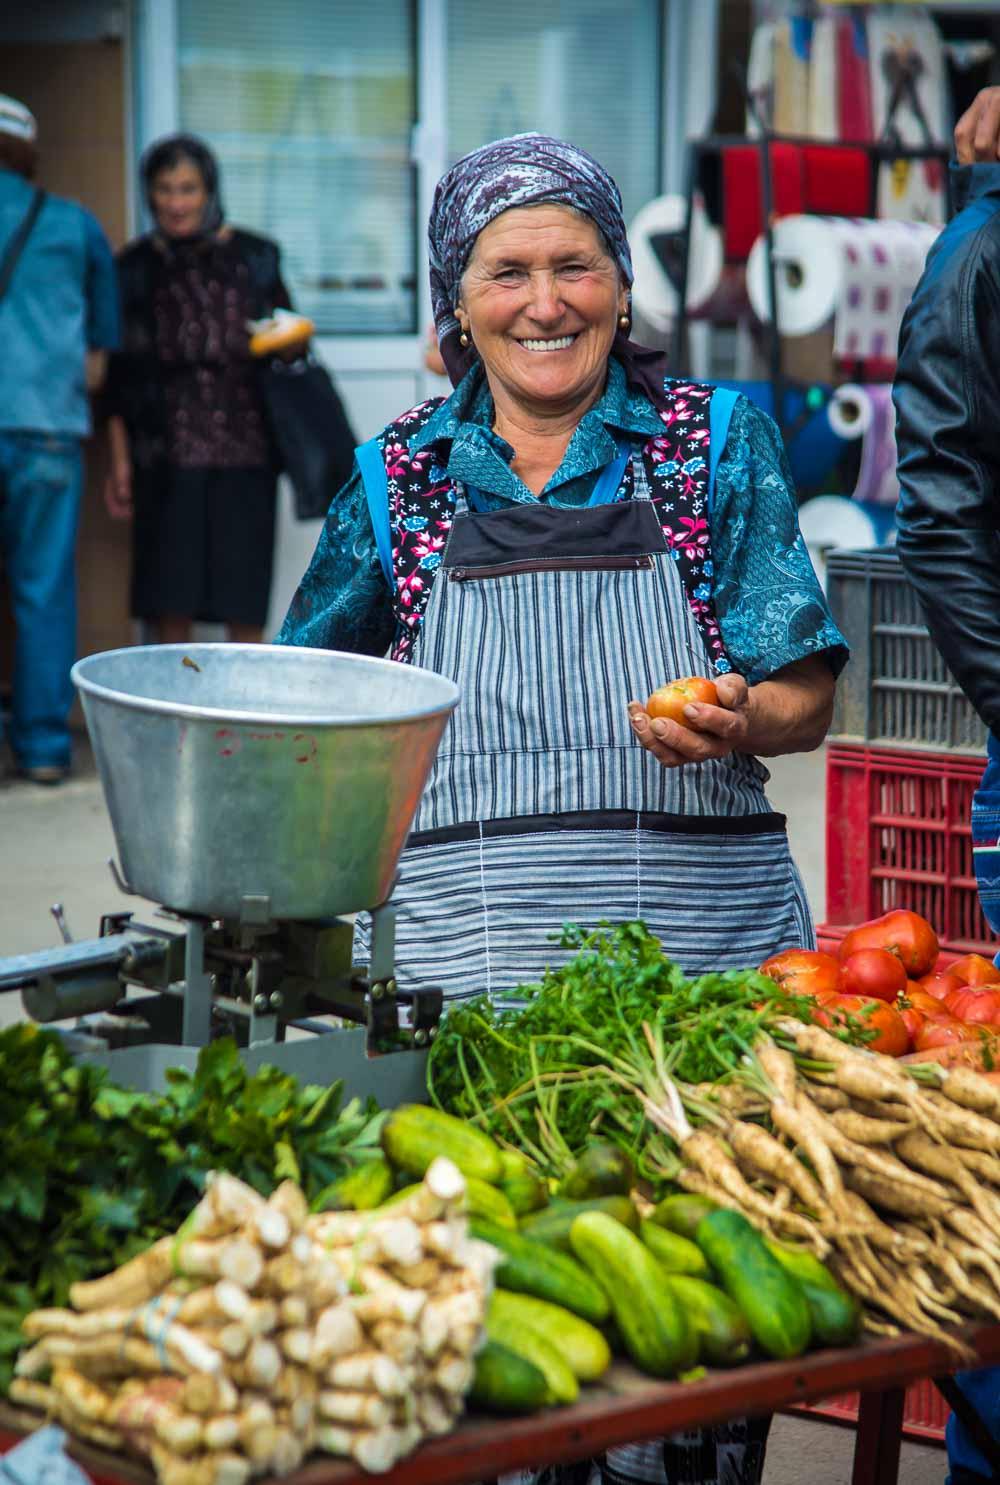 Marktfrau in Hermannstadt, Rumänien